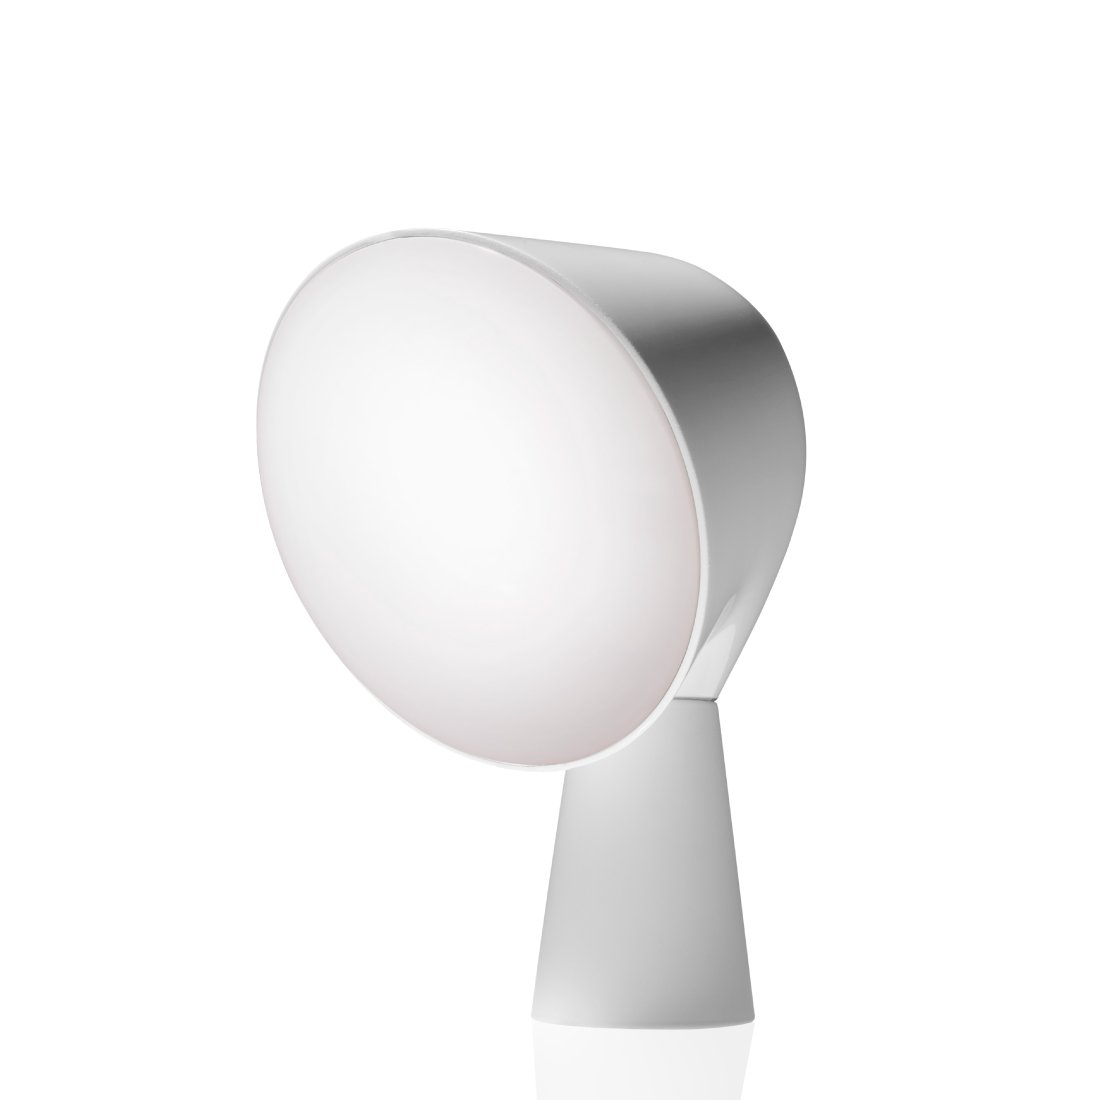 Foscarini Binic Tafellamp Wit